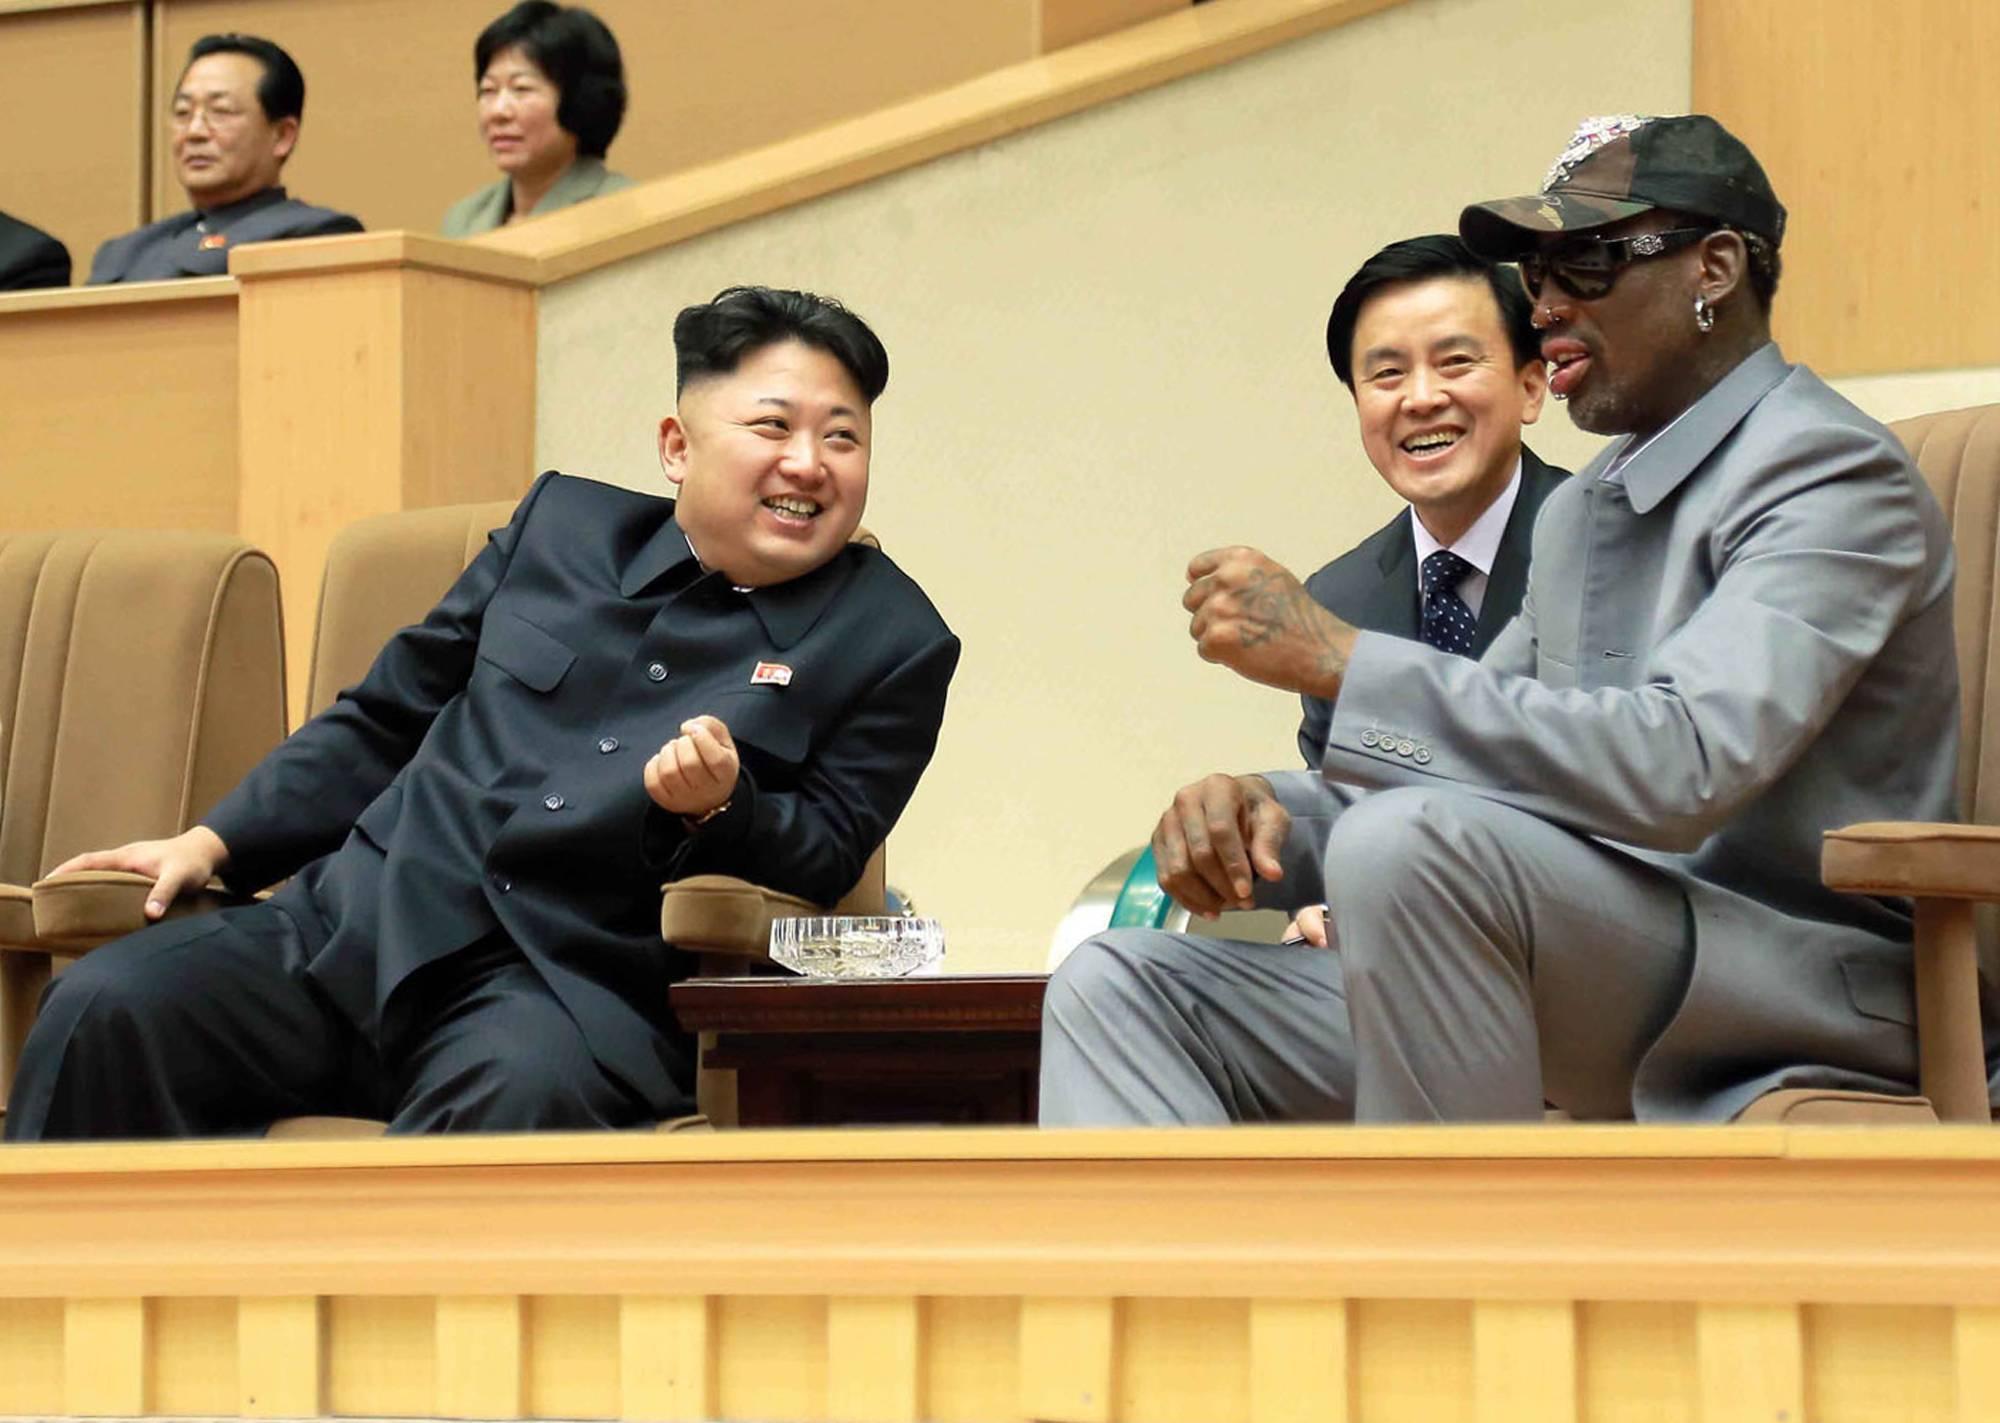 northkorearodmanpuer1-2cbbc99a07236ce581abf0a03badde80.jpg